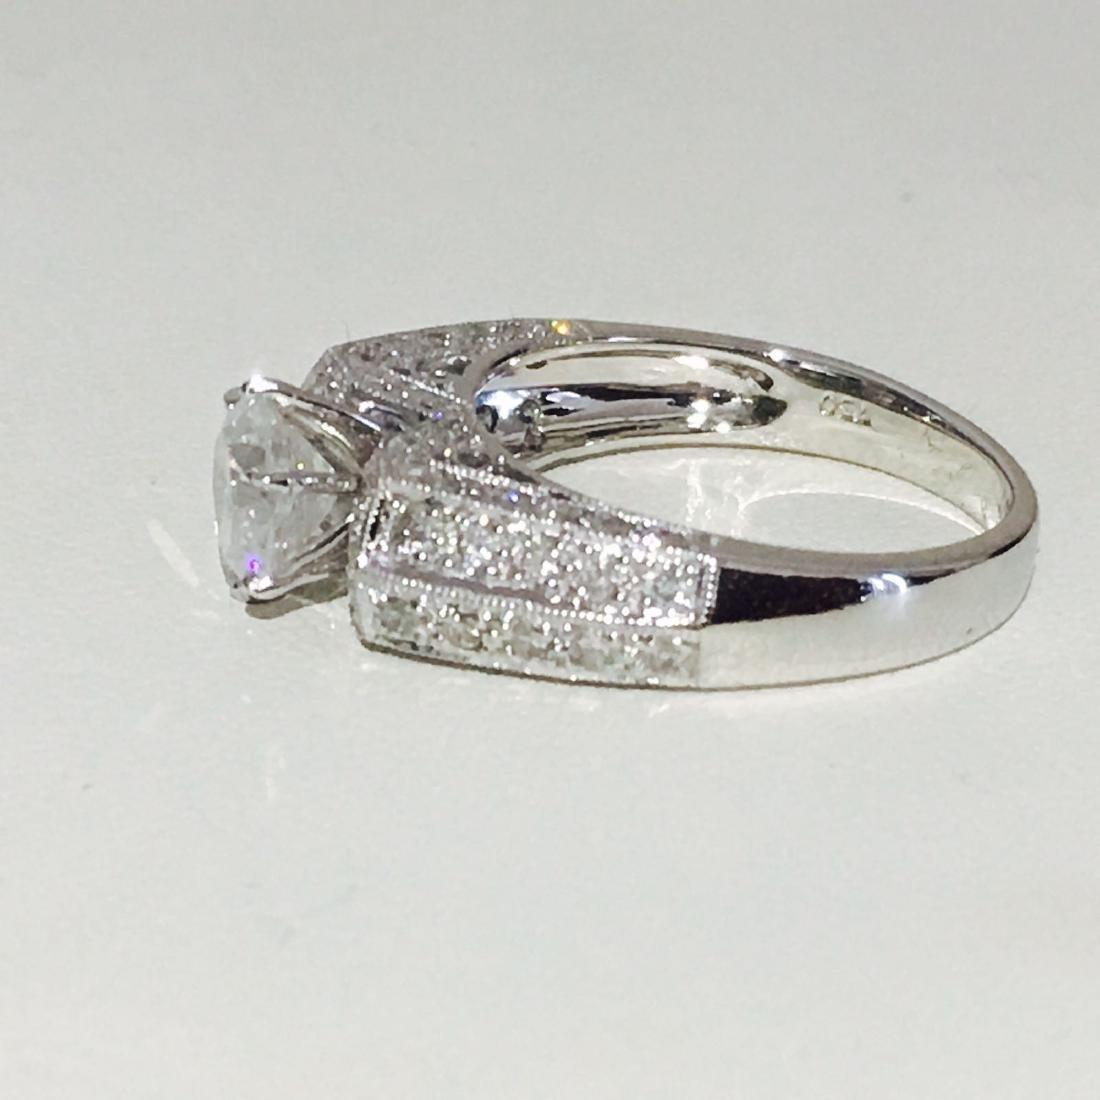 18K White Gold, 2.10 CT Diamond Engagement Ring - 2